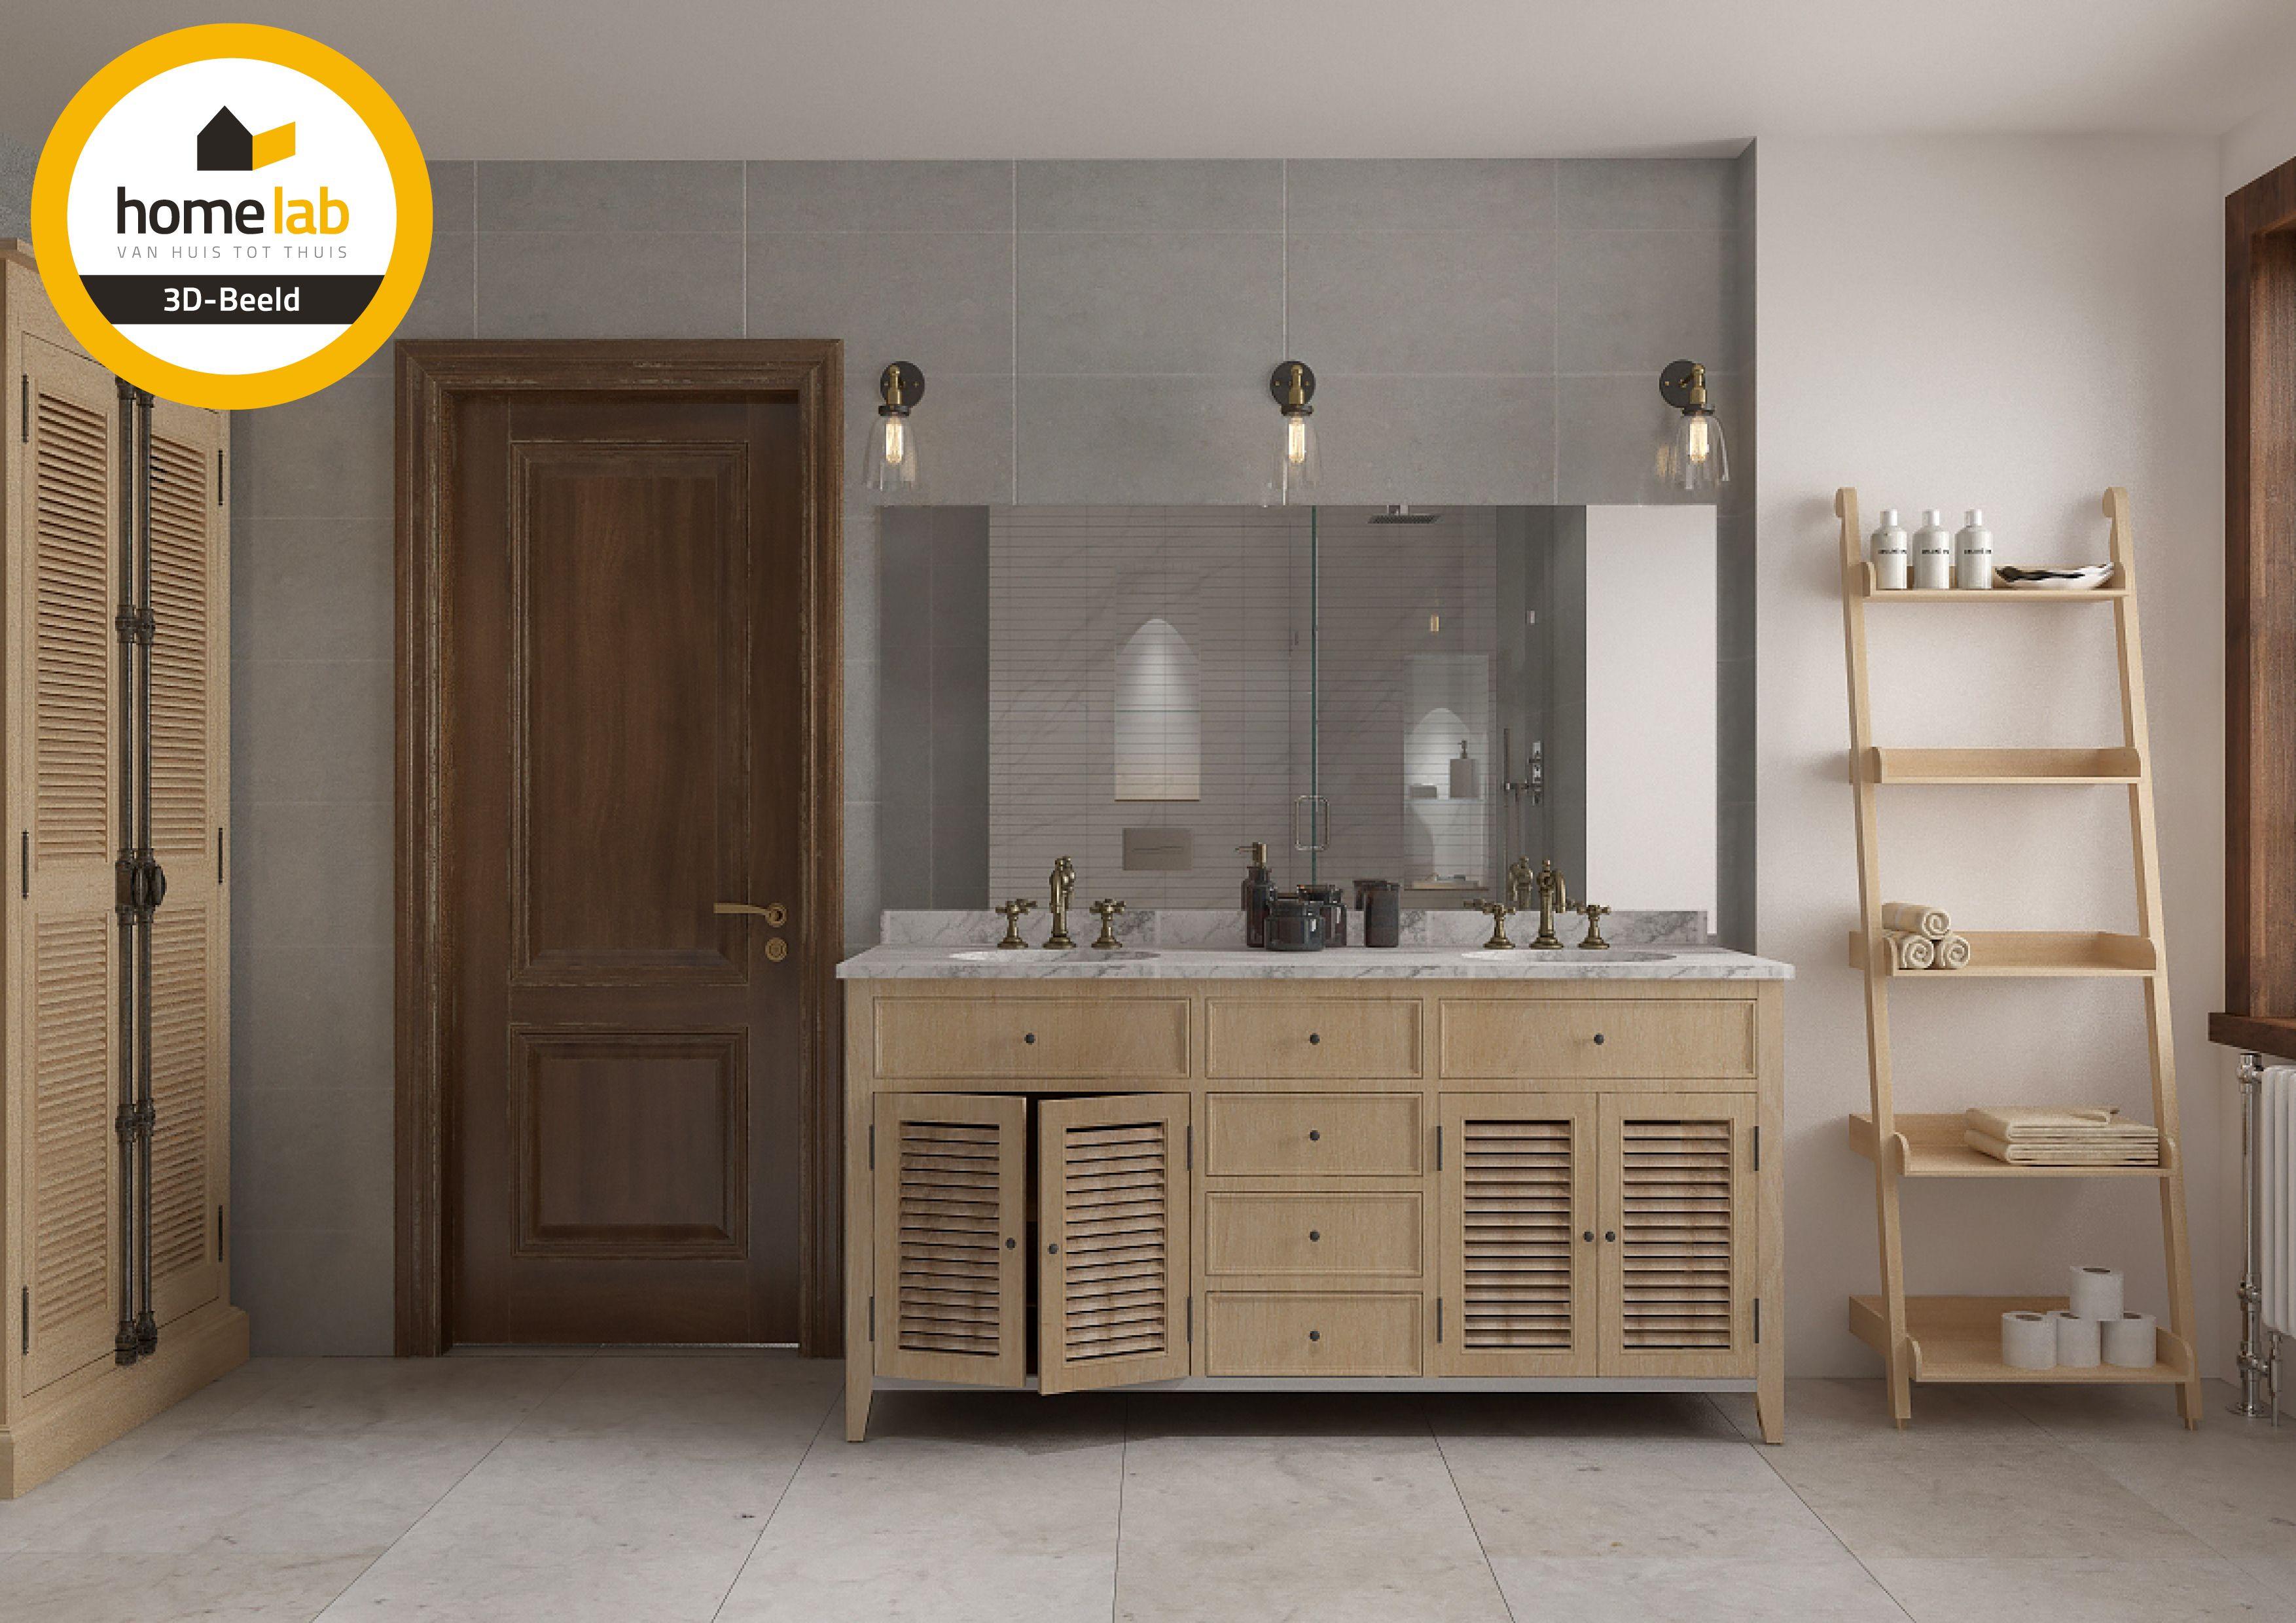 homelab badkamer renovatie pand te leuven | berlaarbaan leuven, Badkamer